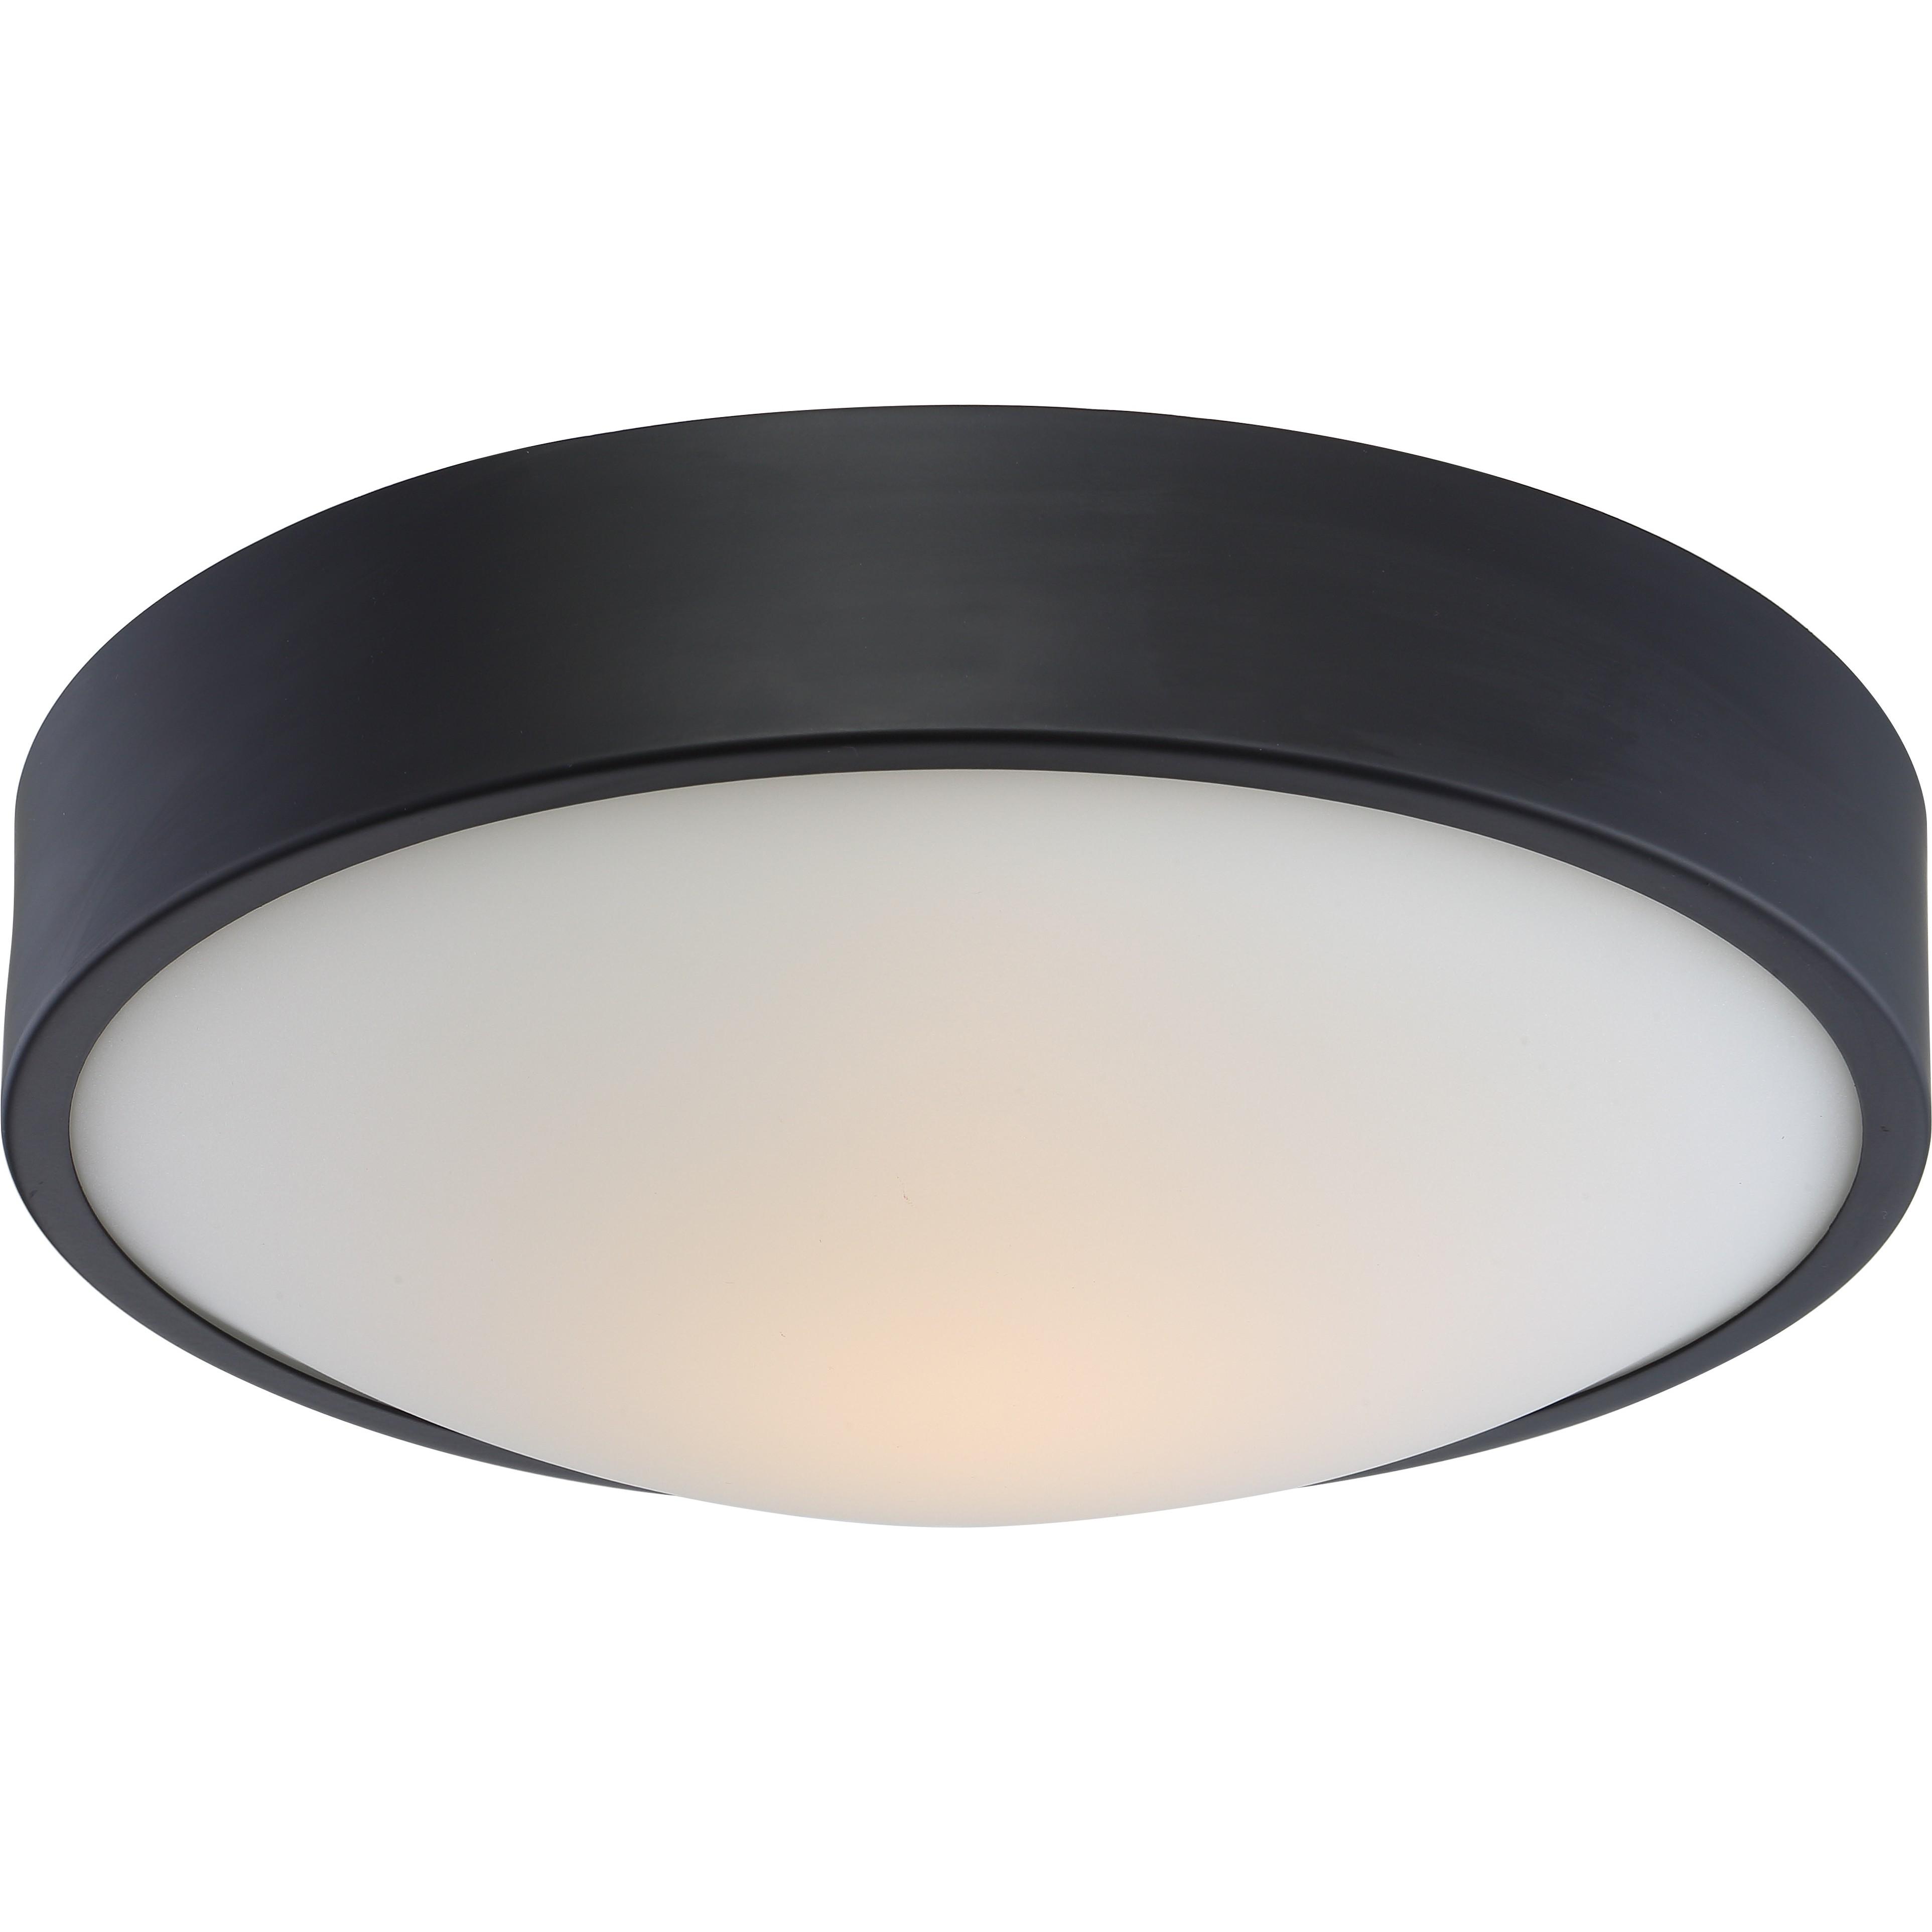 Ceiling Fan: Ceiling Motion Sensor Stair Lights Fan Lightureures Inside Outdoor Ceiling Motion Sensor Lights (#2 of 15)